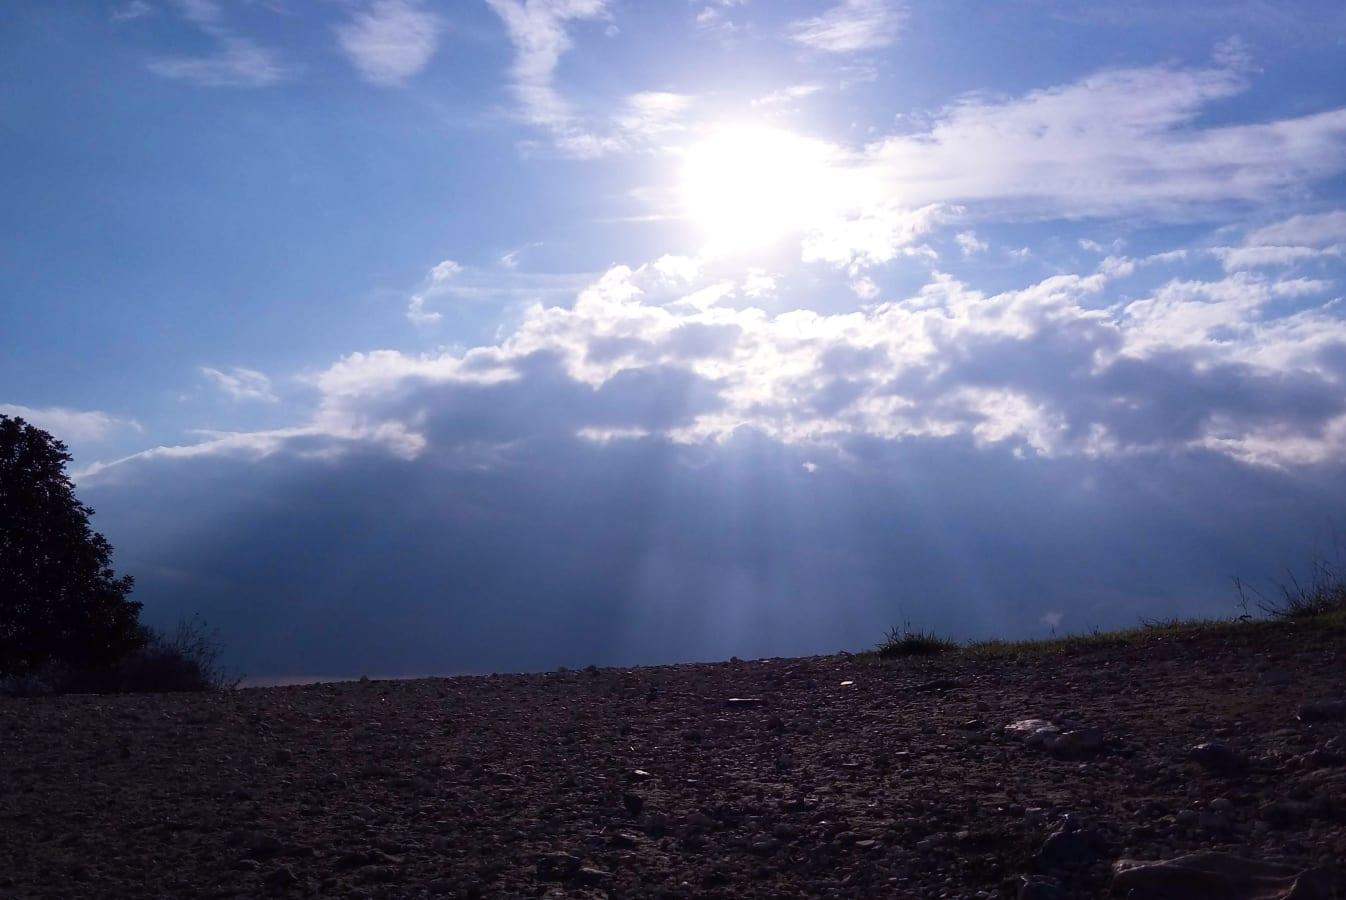 Bright Sun Rays Hitting the Dark Rocky Ground